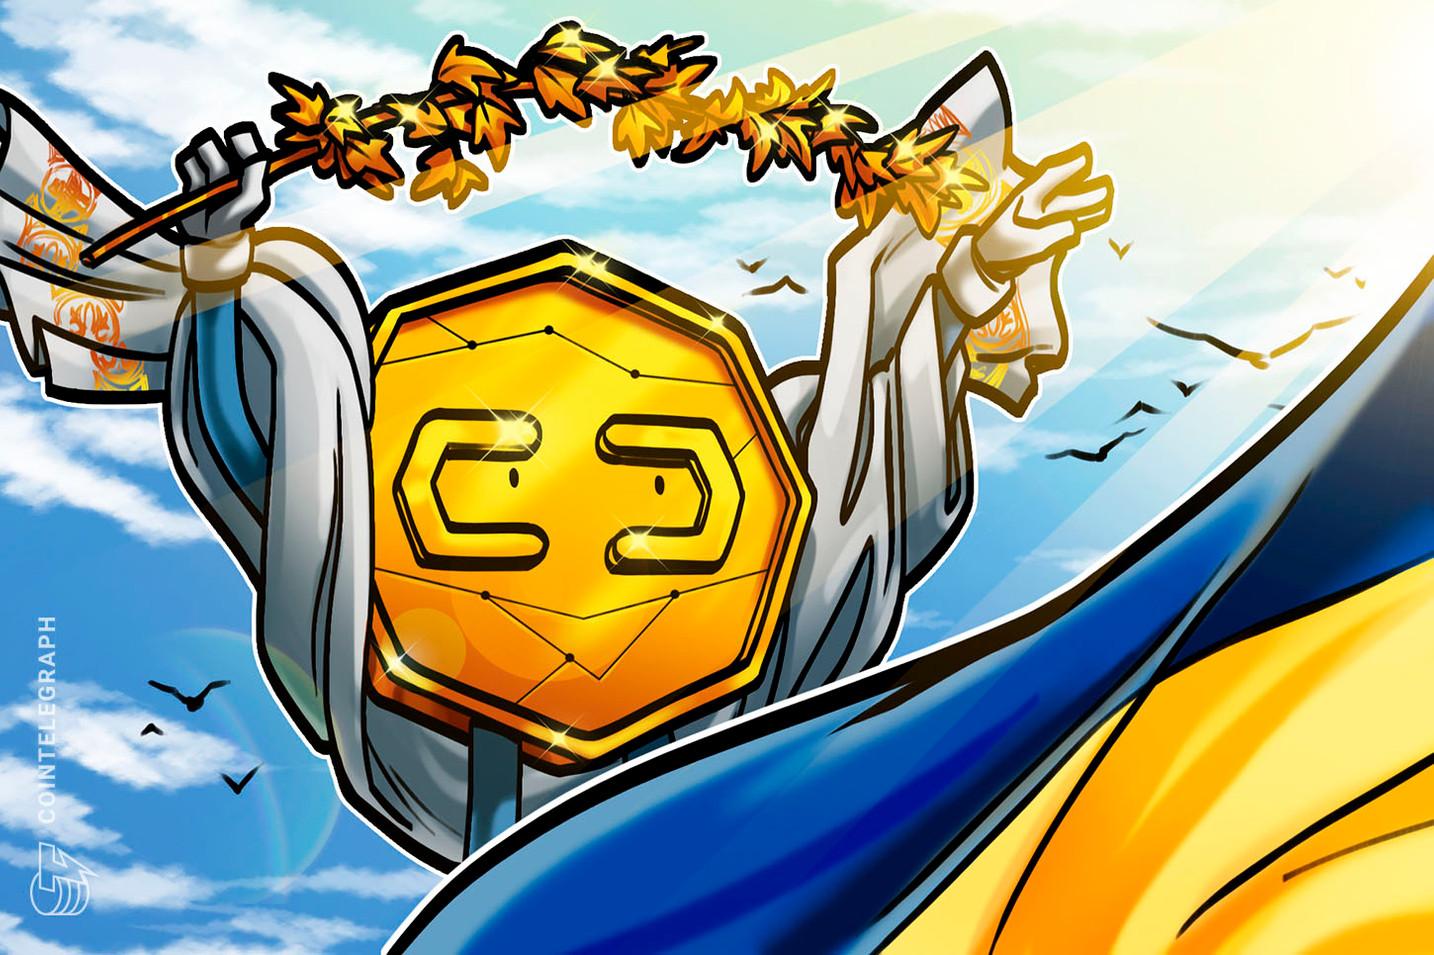 Ukraine passes legislation to recognize and regulate crypto